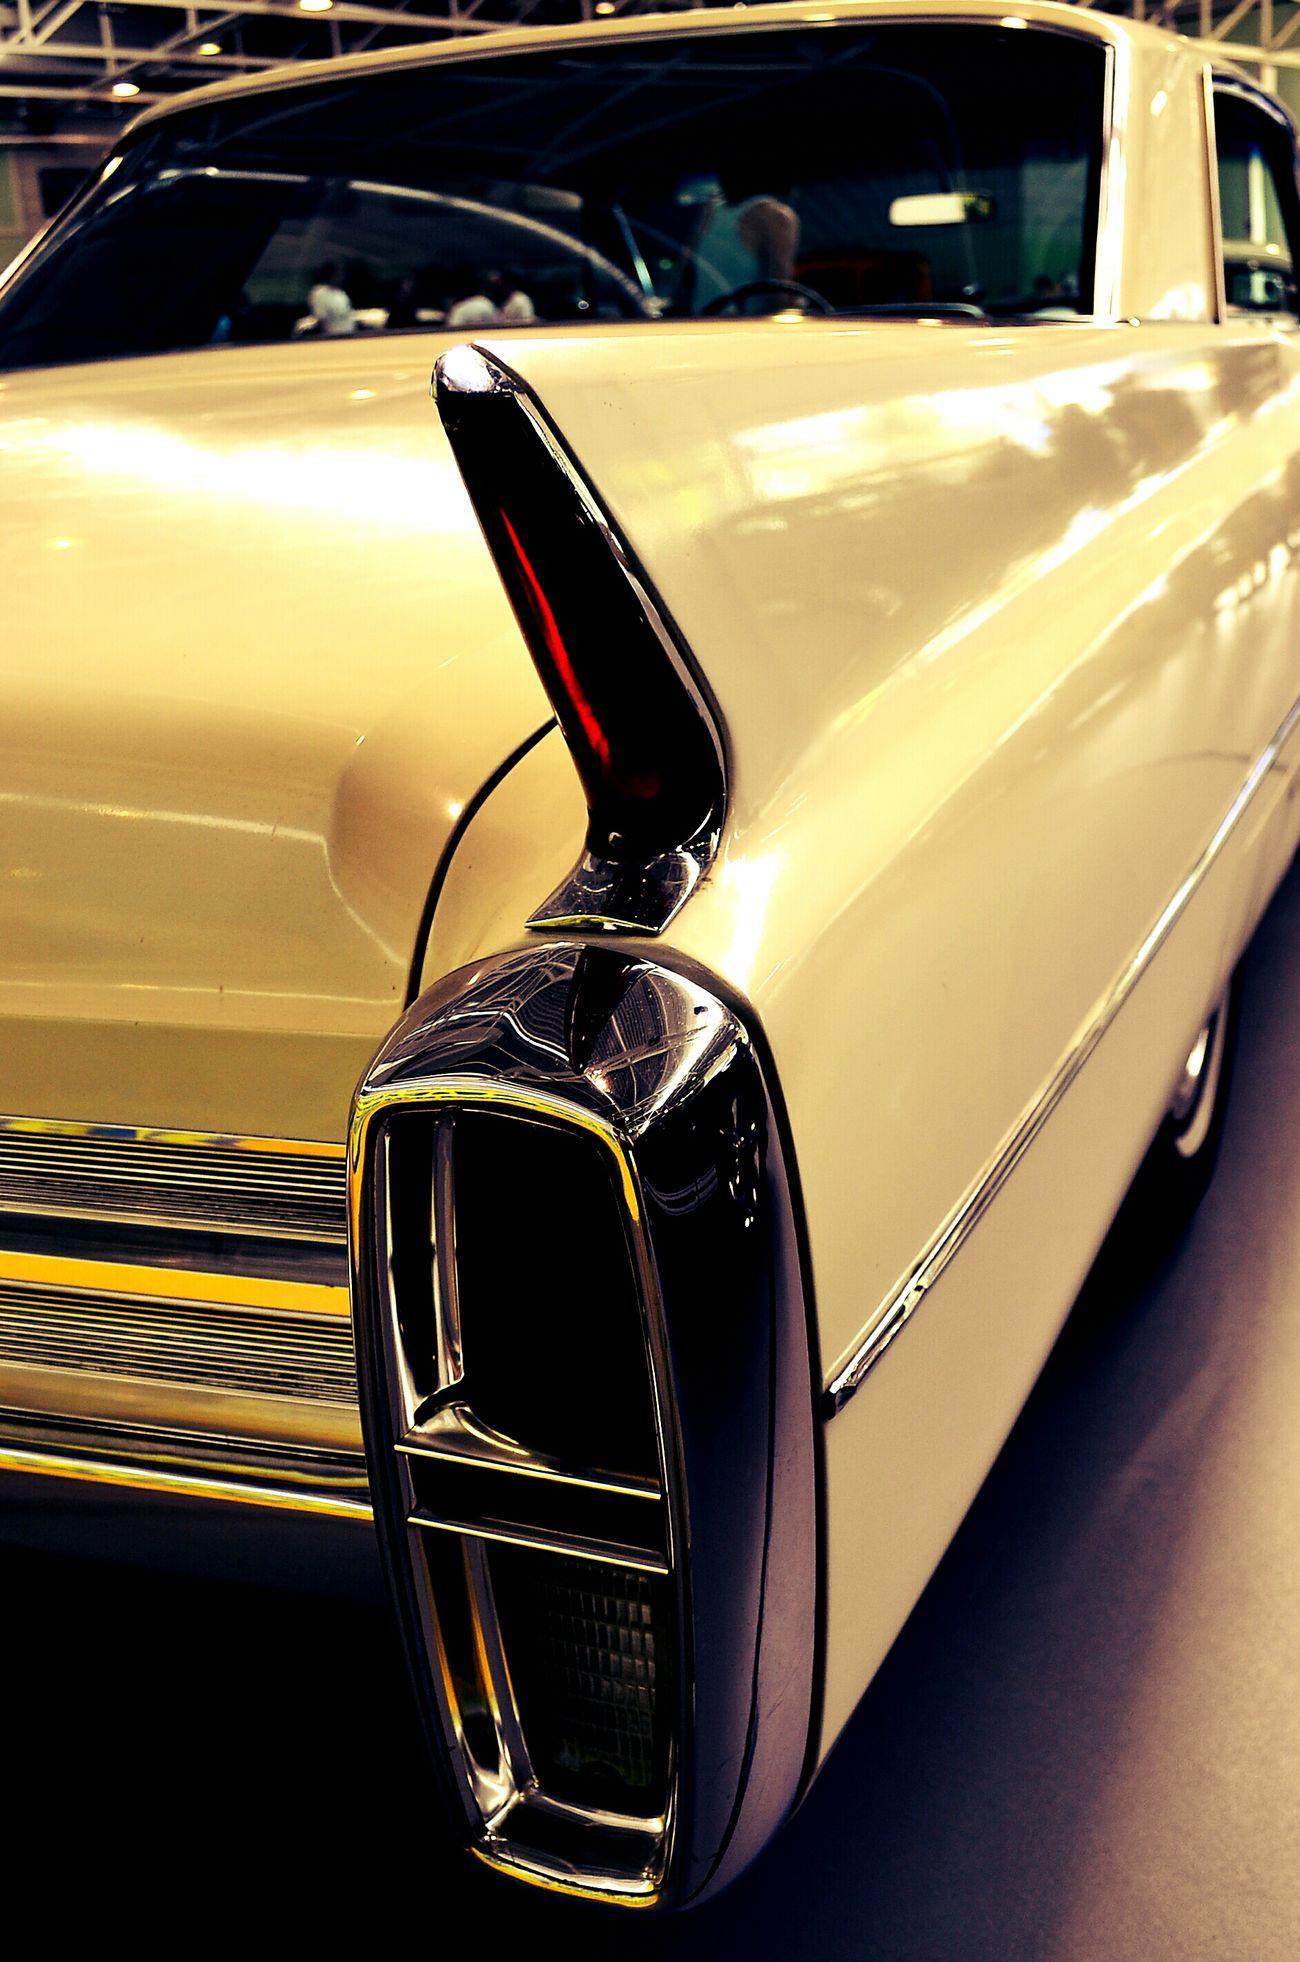 Americancars Uscars Chrome Heck Cars EyeEm Gallery Auto Automobile